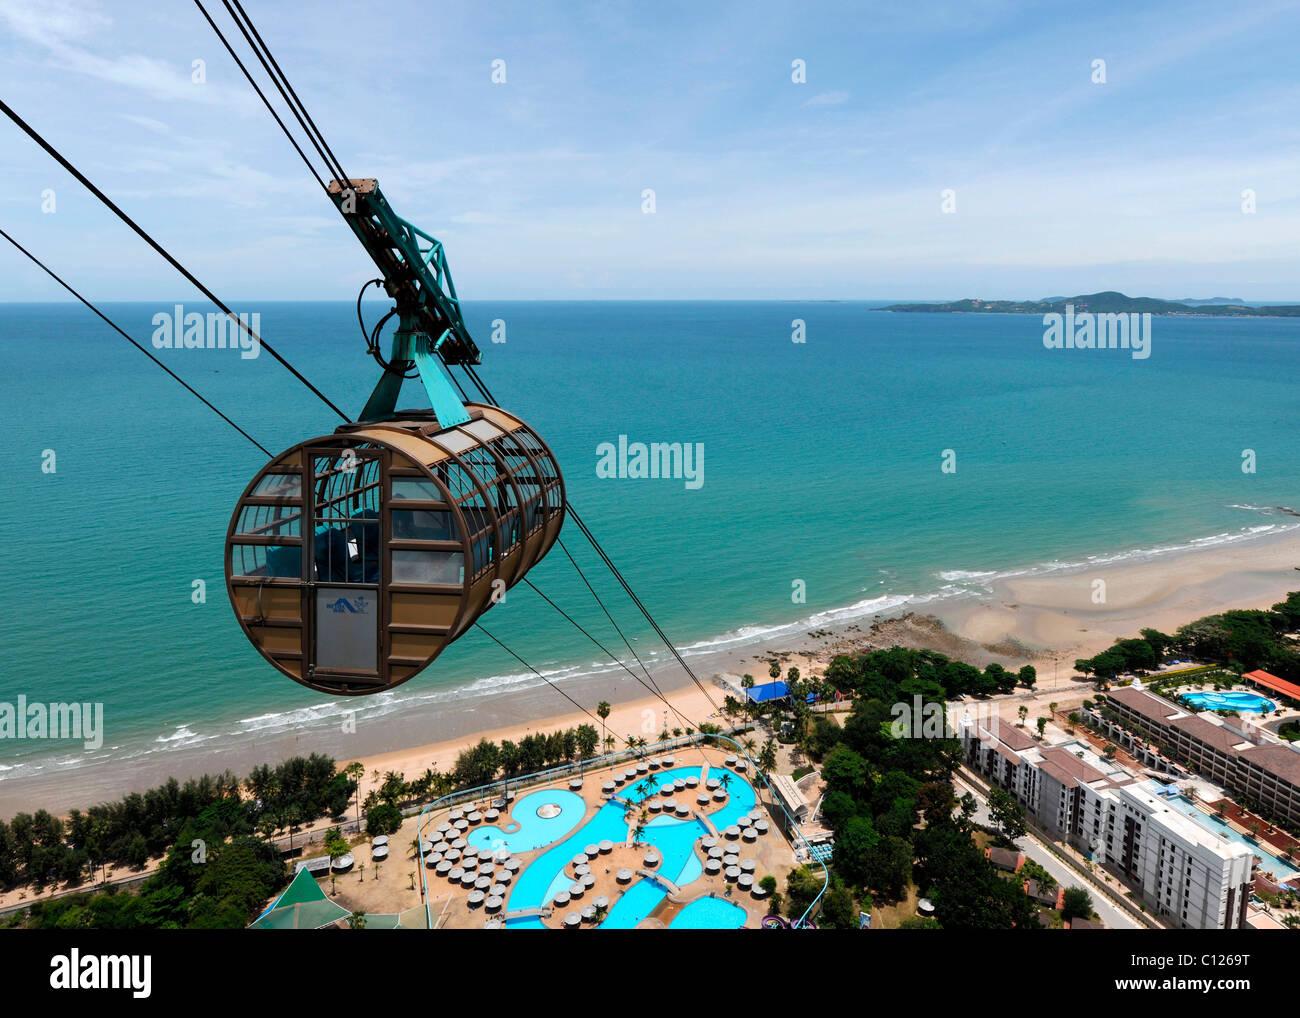 Pattaya Park Beach Hotel